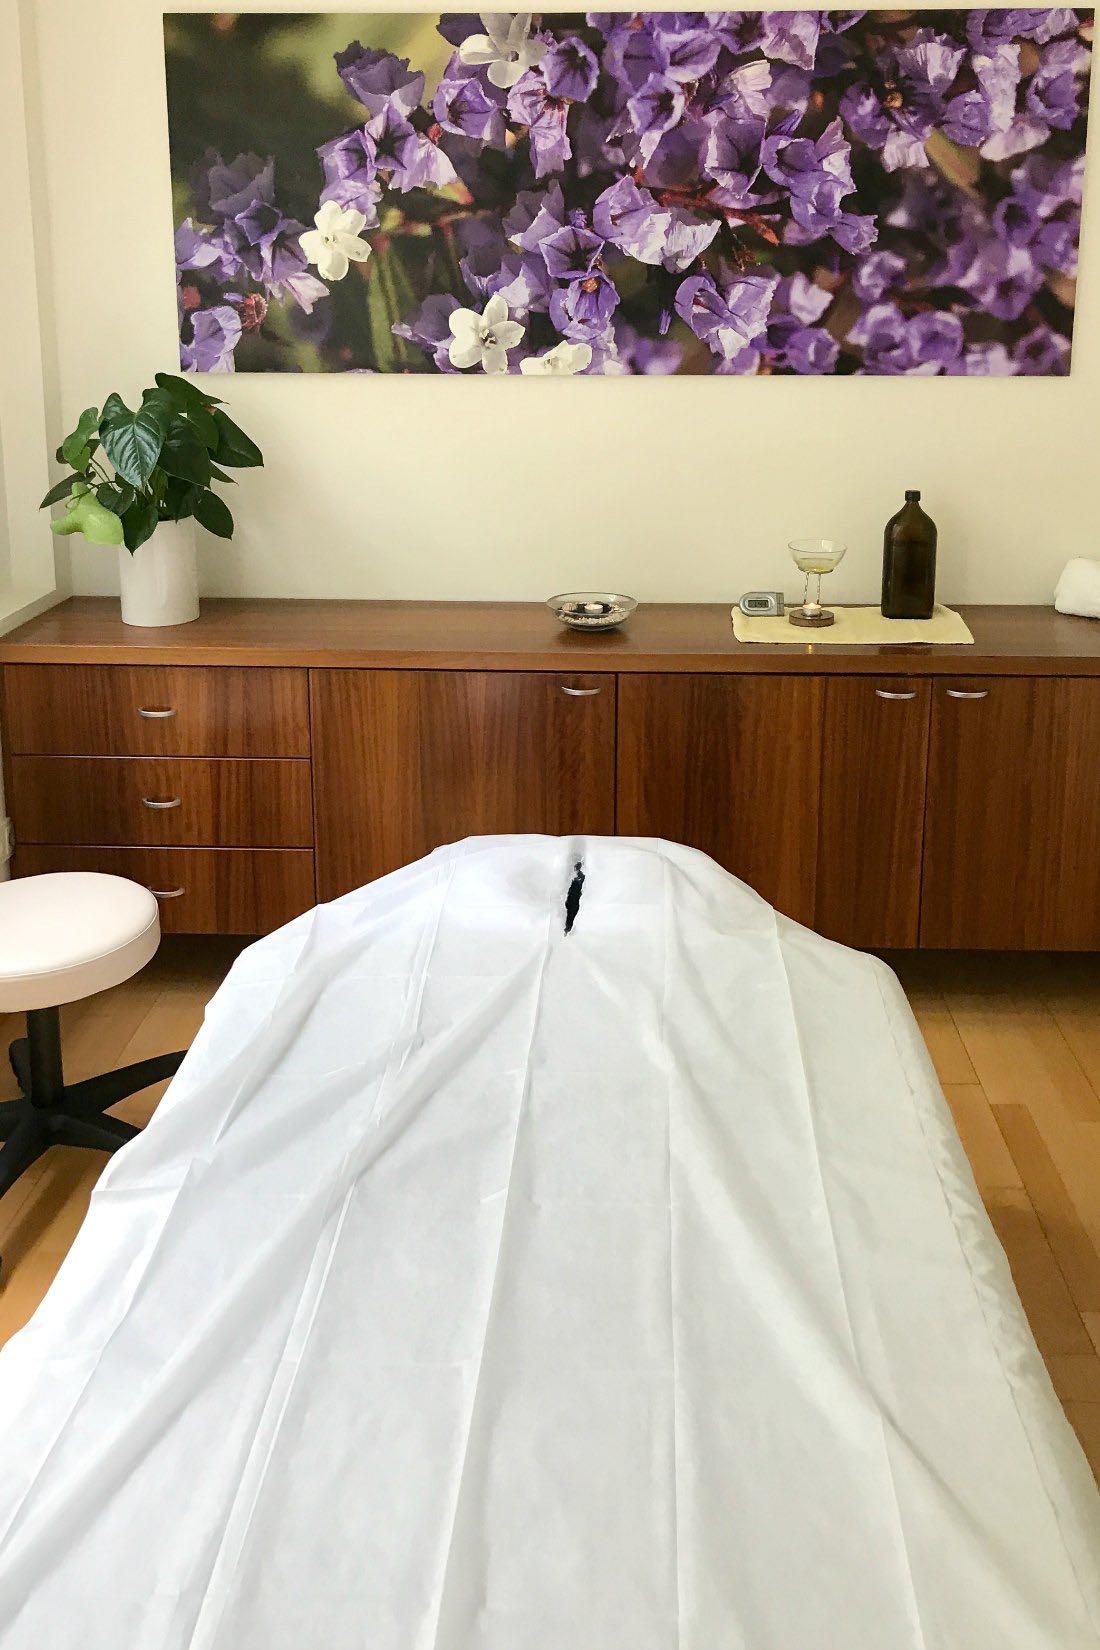 Océano Hotel Health Spa auf Teneriffa